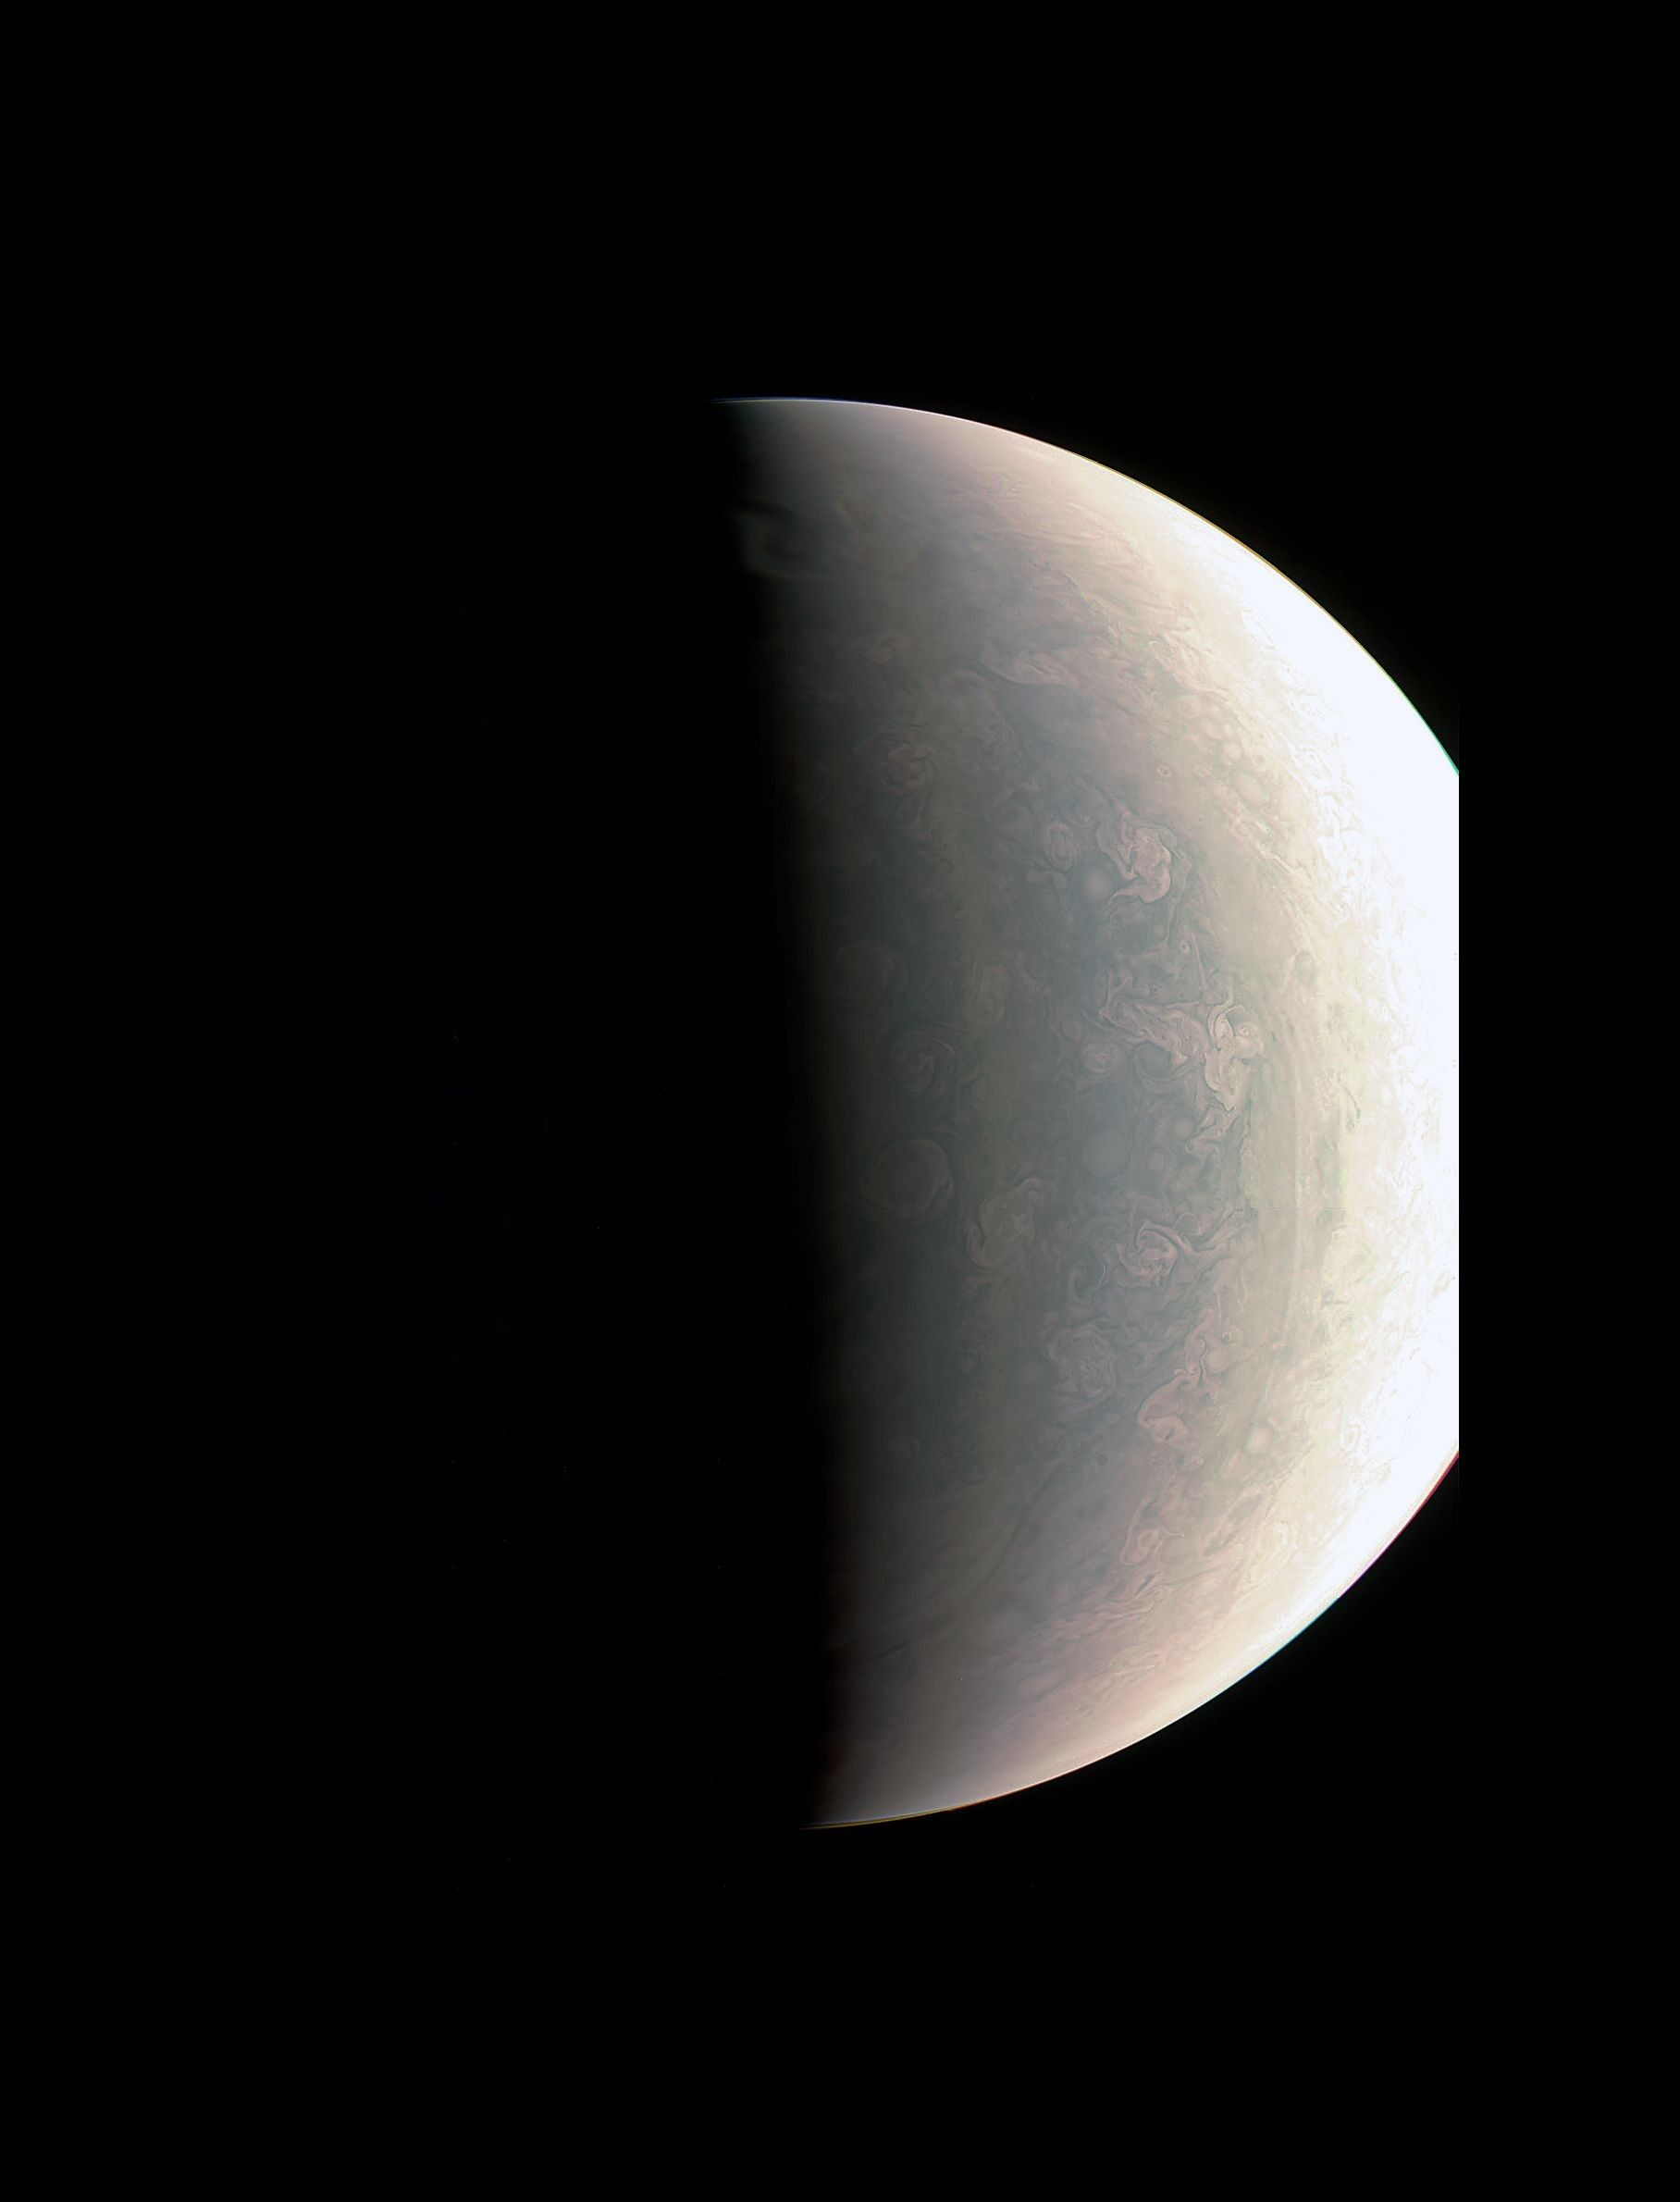 NASA/JPL-Caltech/SwRI/MSSS